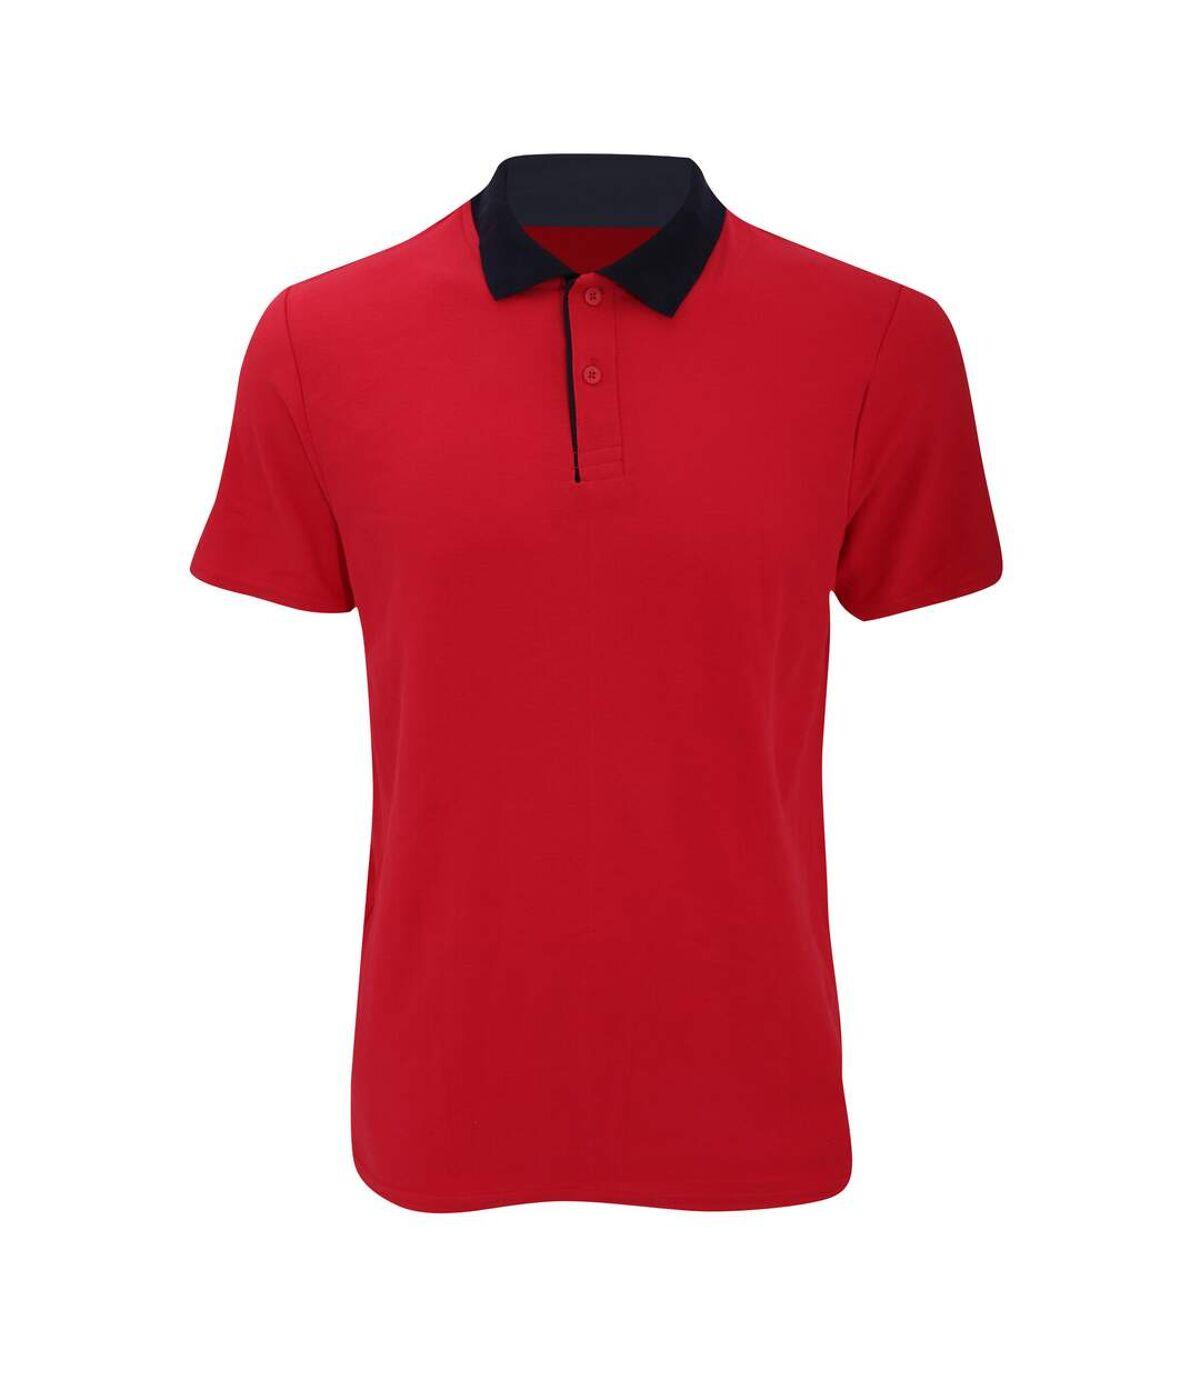 Anvil Mens Fashion Double Pique Plain Polo Shirt (210 GSM) (Red/ Navy) - UTRW2535